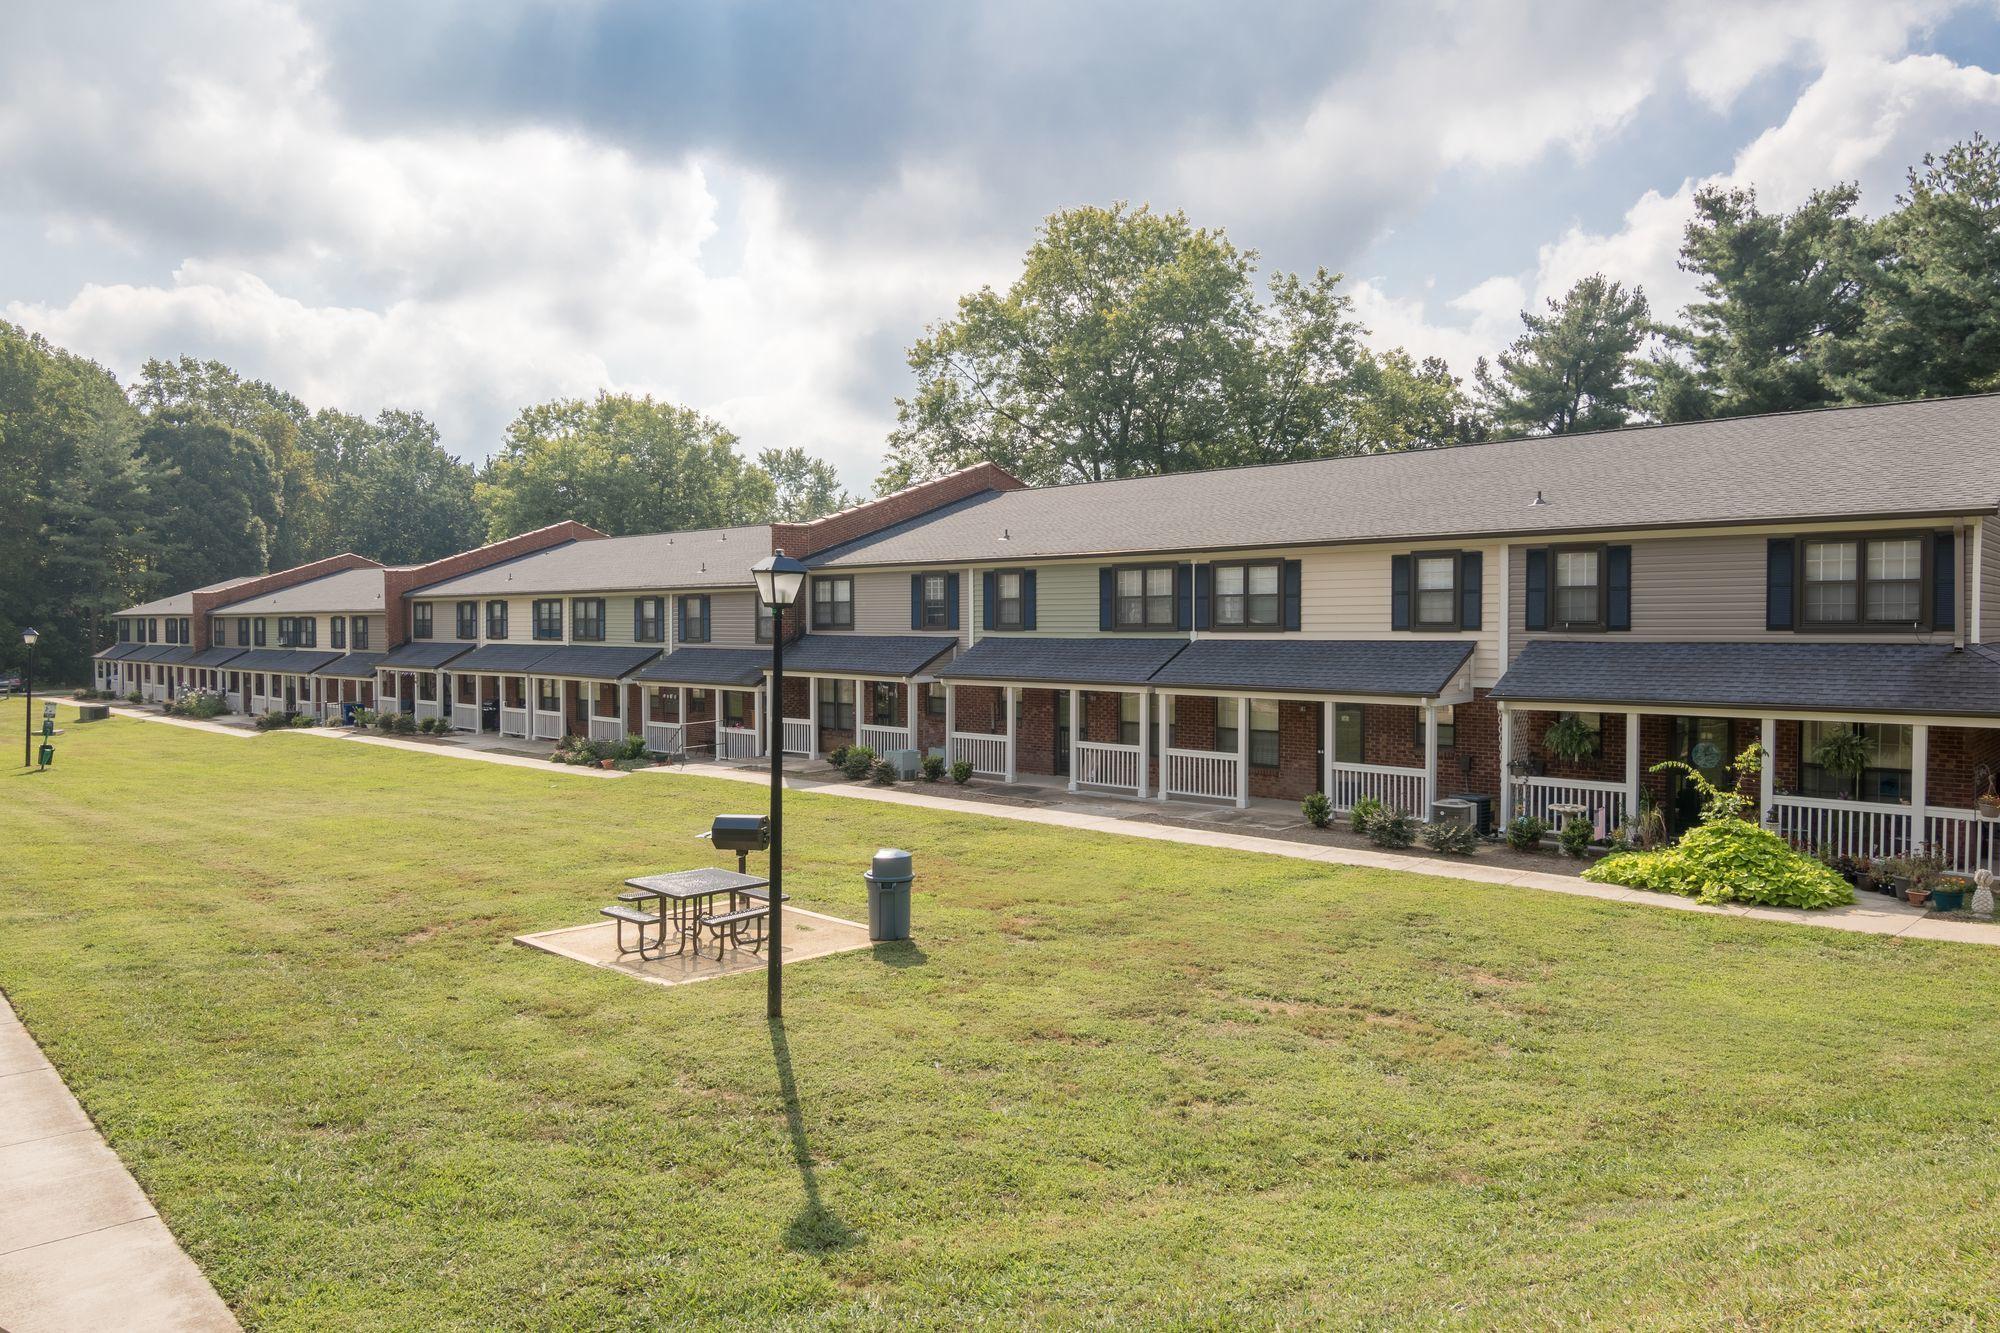 Apartments Near Winston Salem Glendare Park for Winston Salem Students in Winston Salem, NC